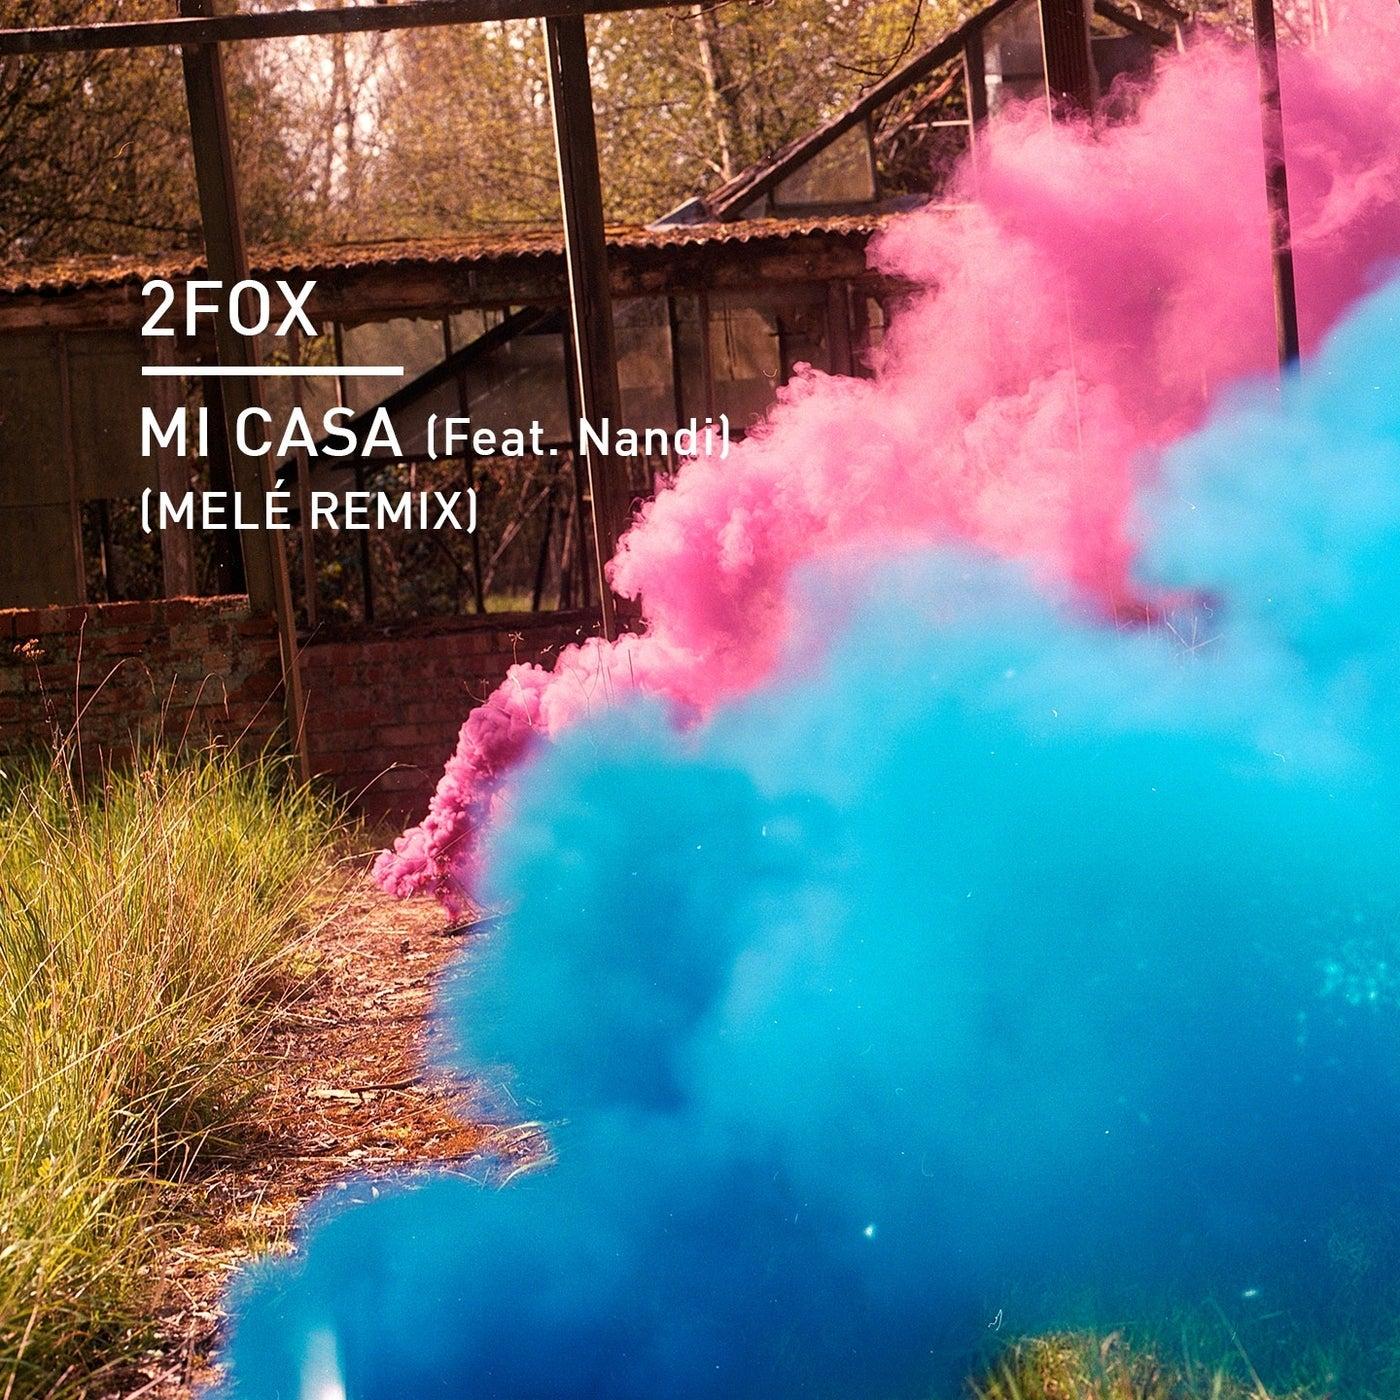 Mi Casa feat. Nandi (Mele Remix)